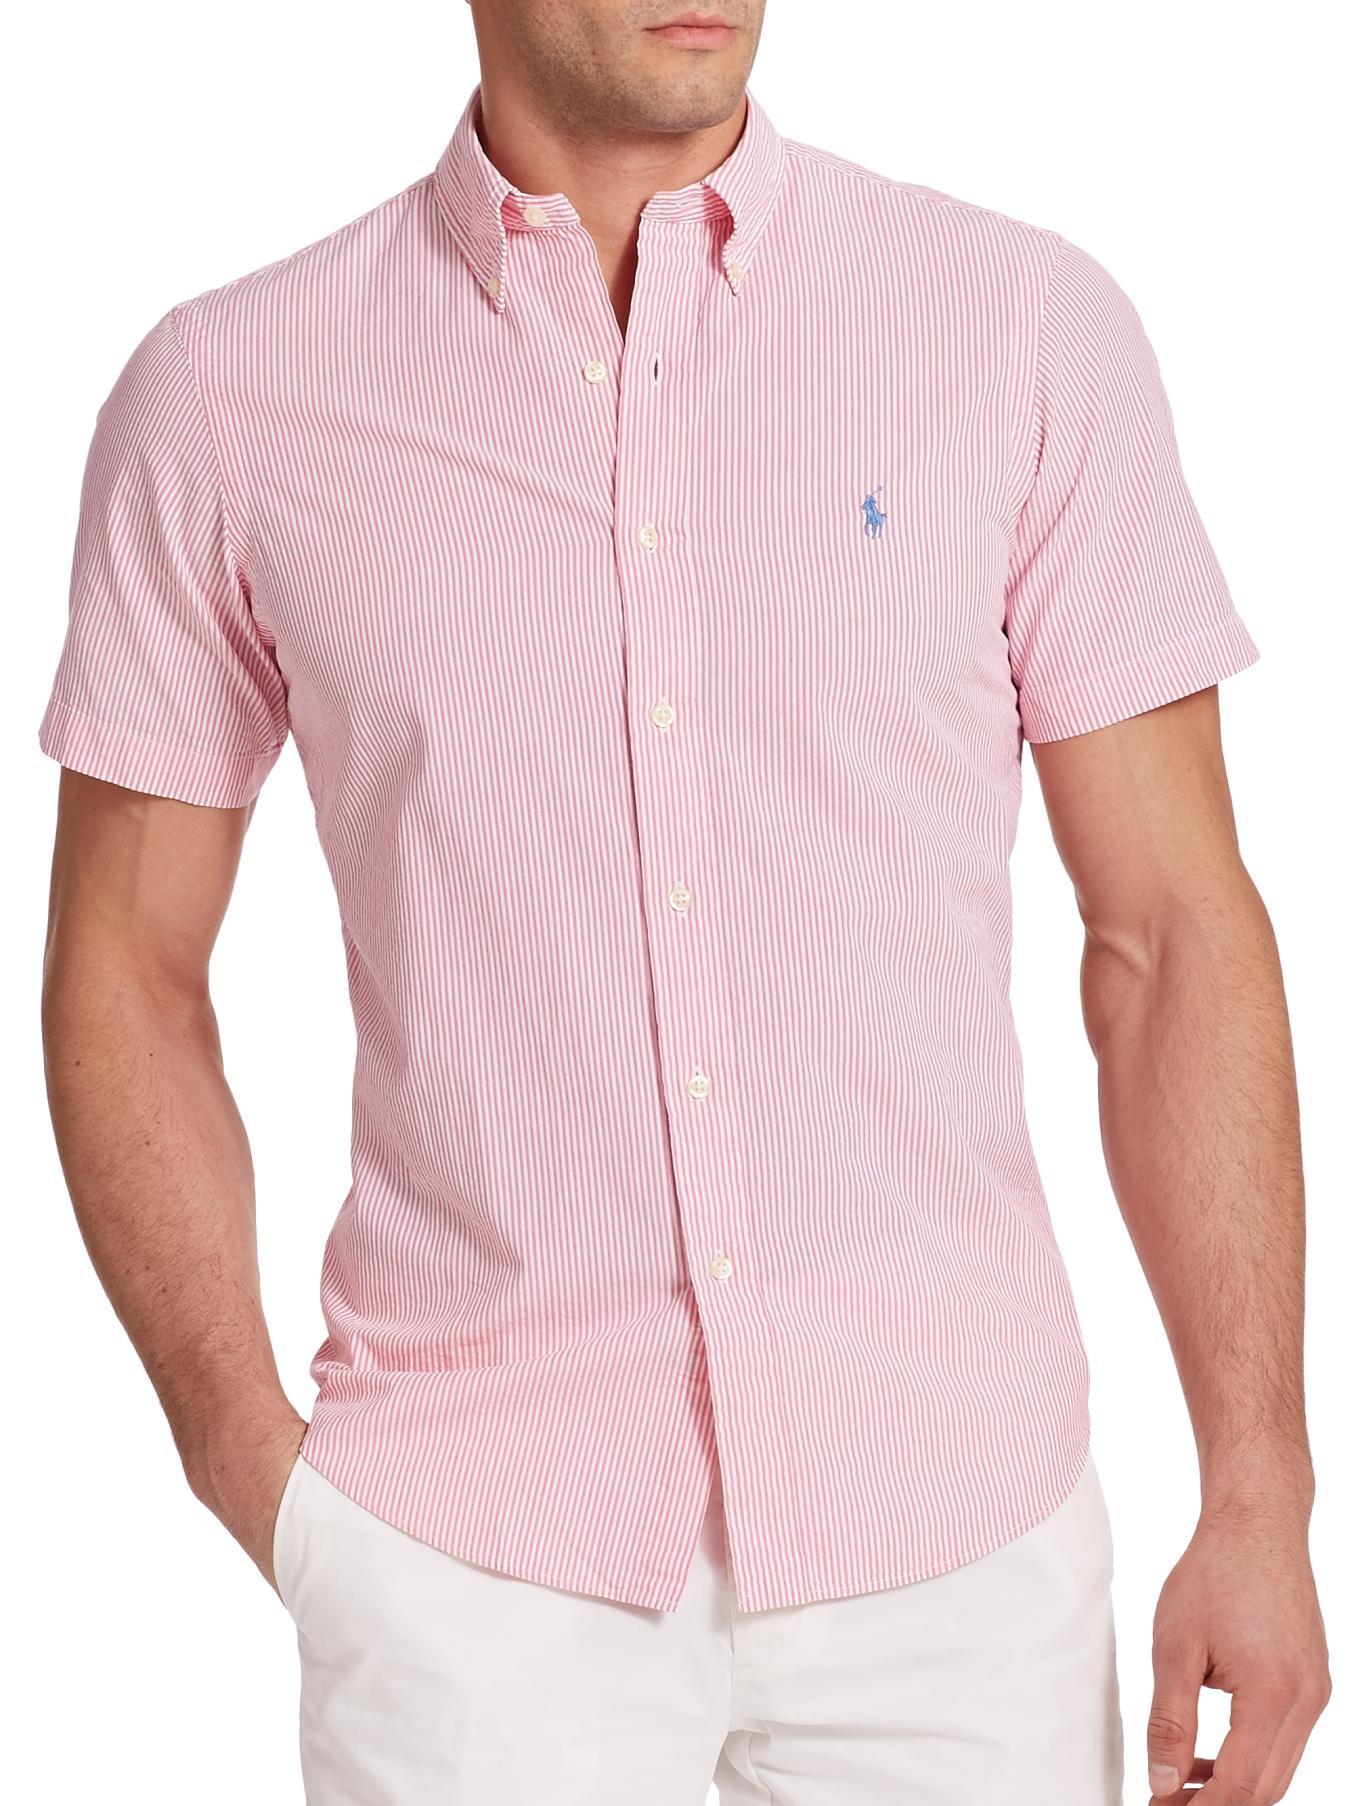 4a8ac8a0 Polo Ralph Lauren Striped Seersucker Sportshirt in Pink for Men - Lyst